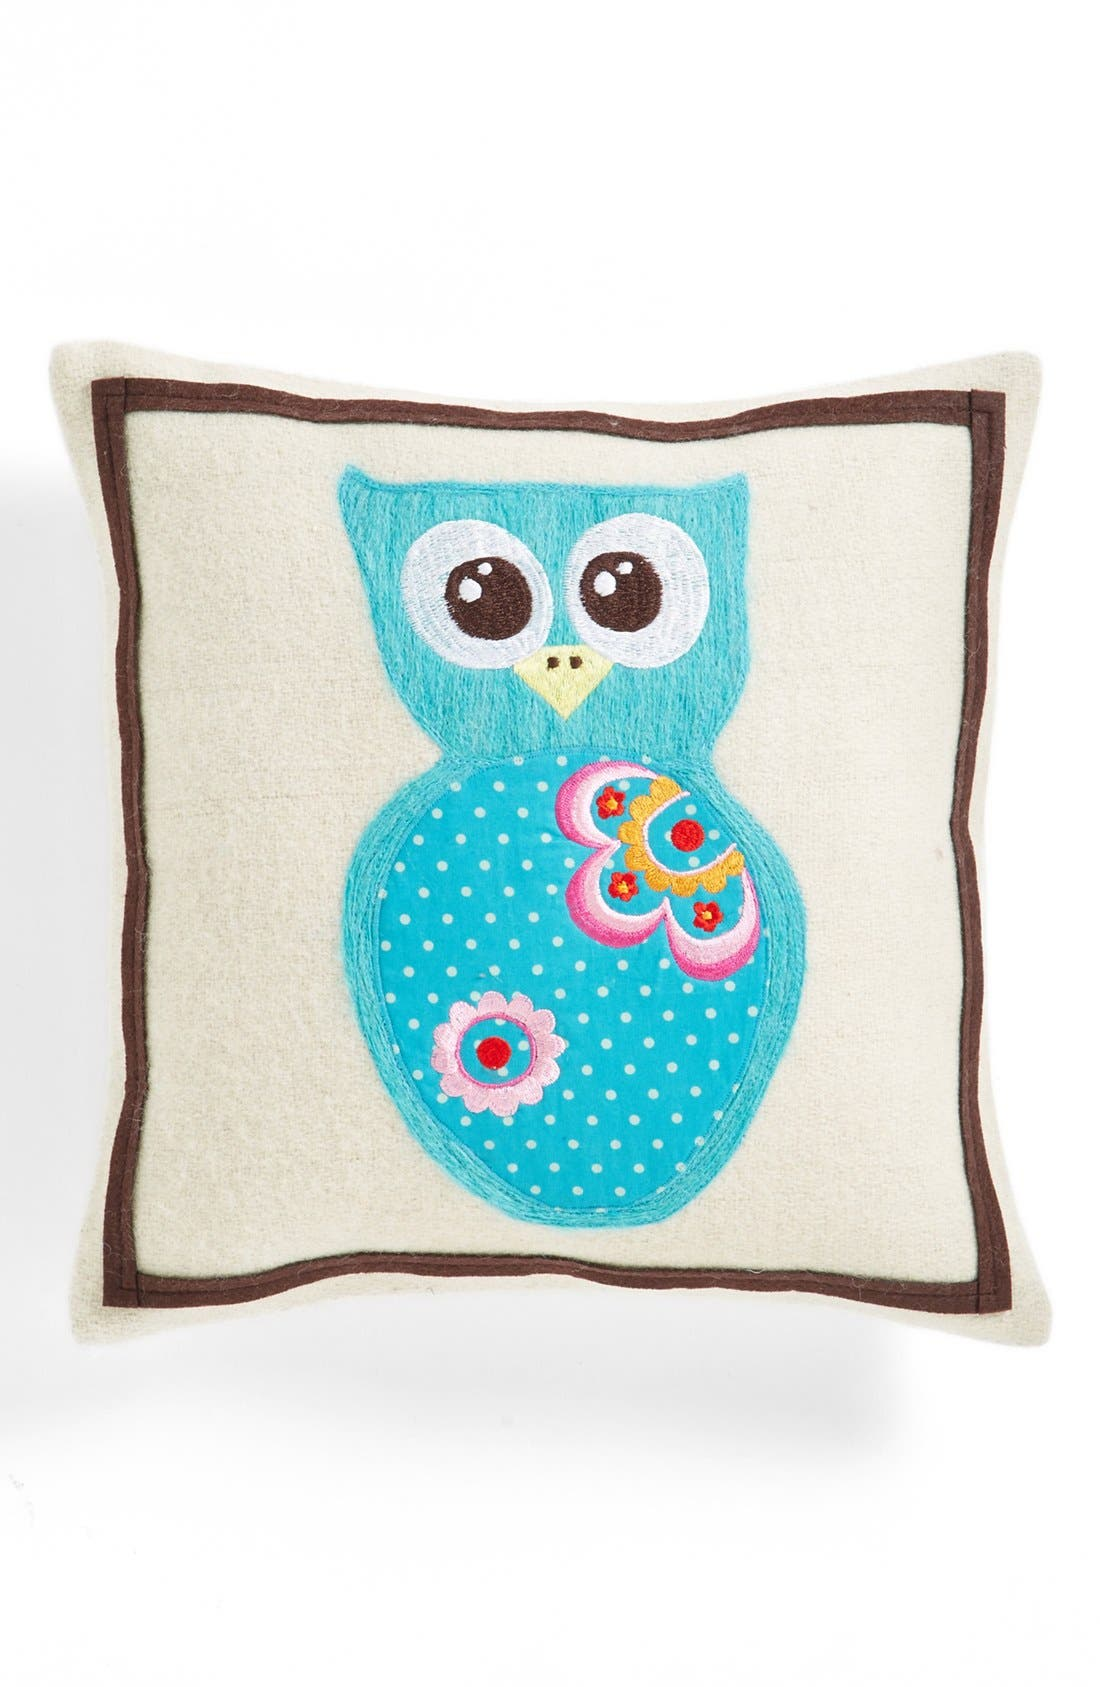 Main Image - Amity Home 'Owl' Decorative Pillow